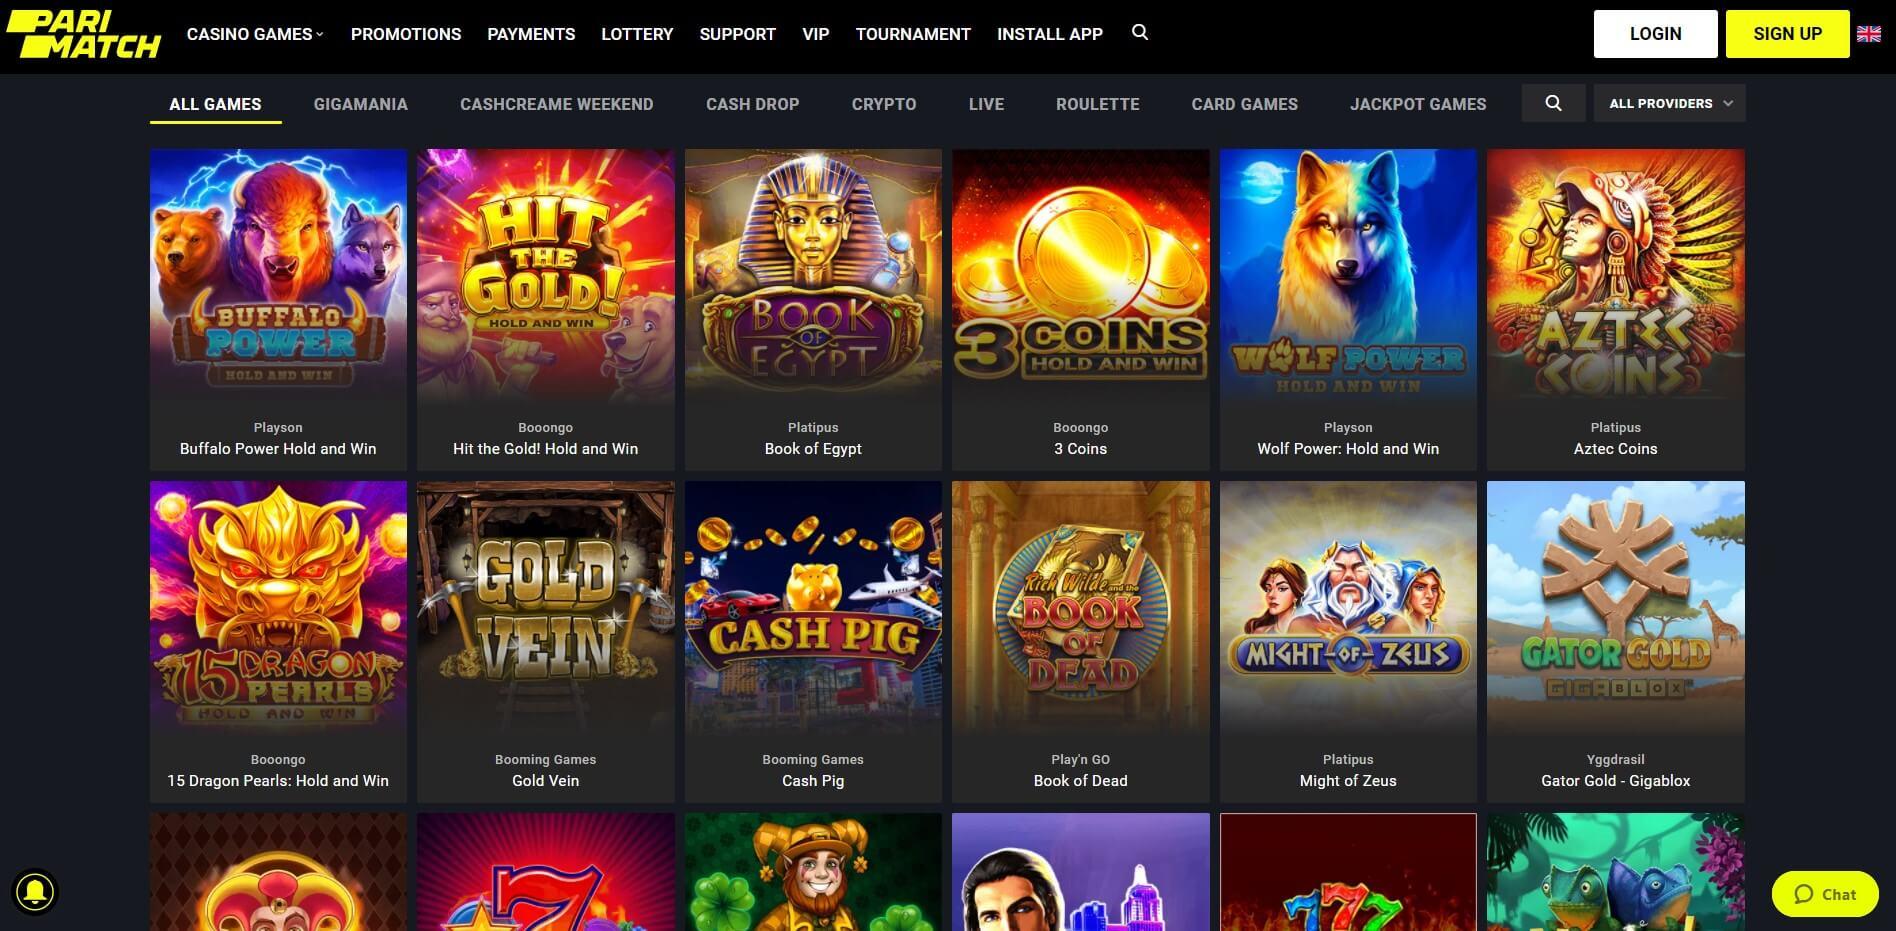 Games at PariMatch Casino